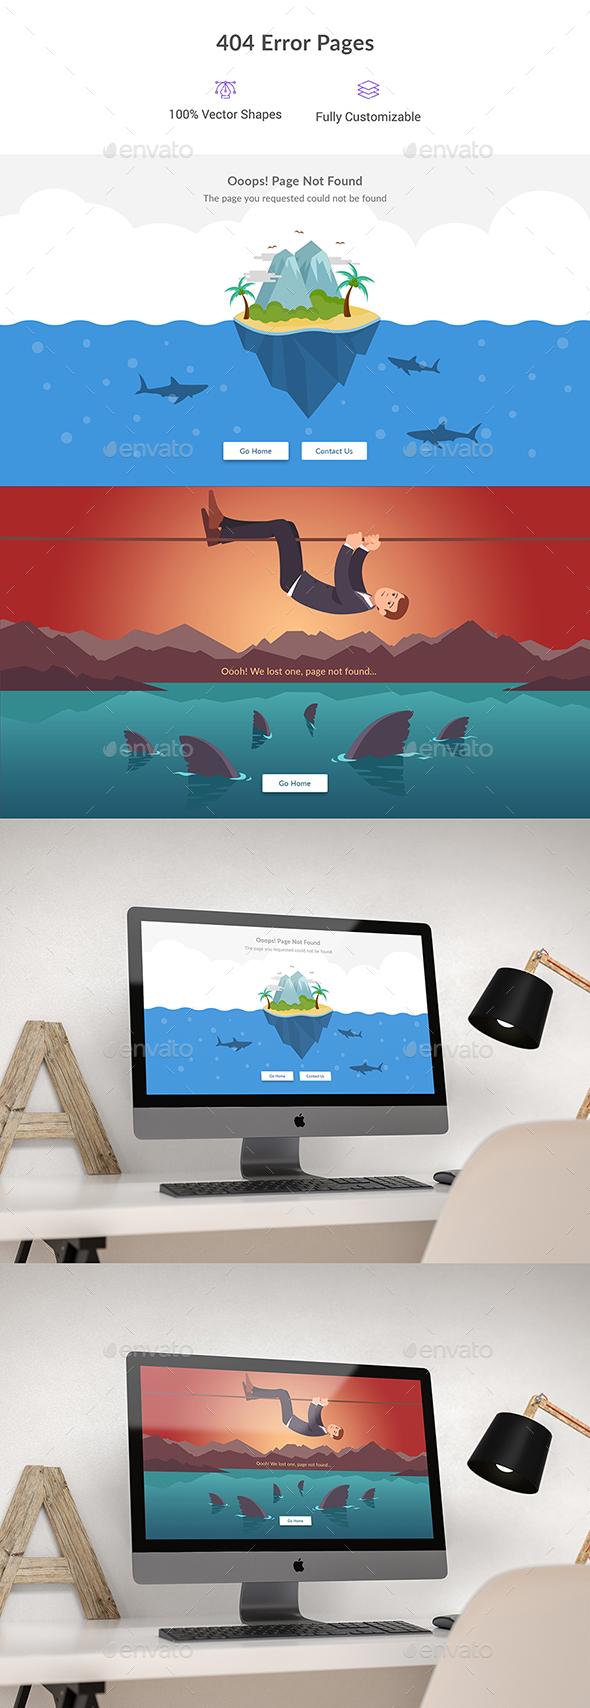 404 Error Pages - 404 Pages Web Elements